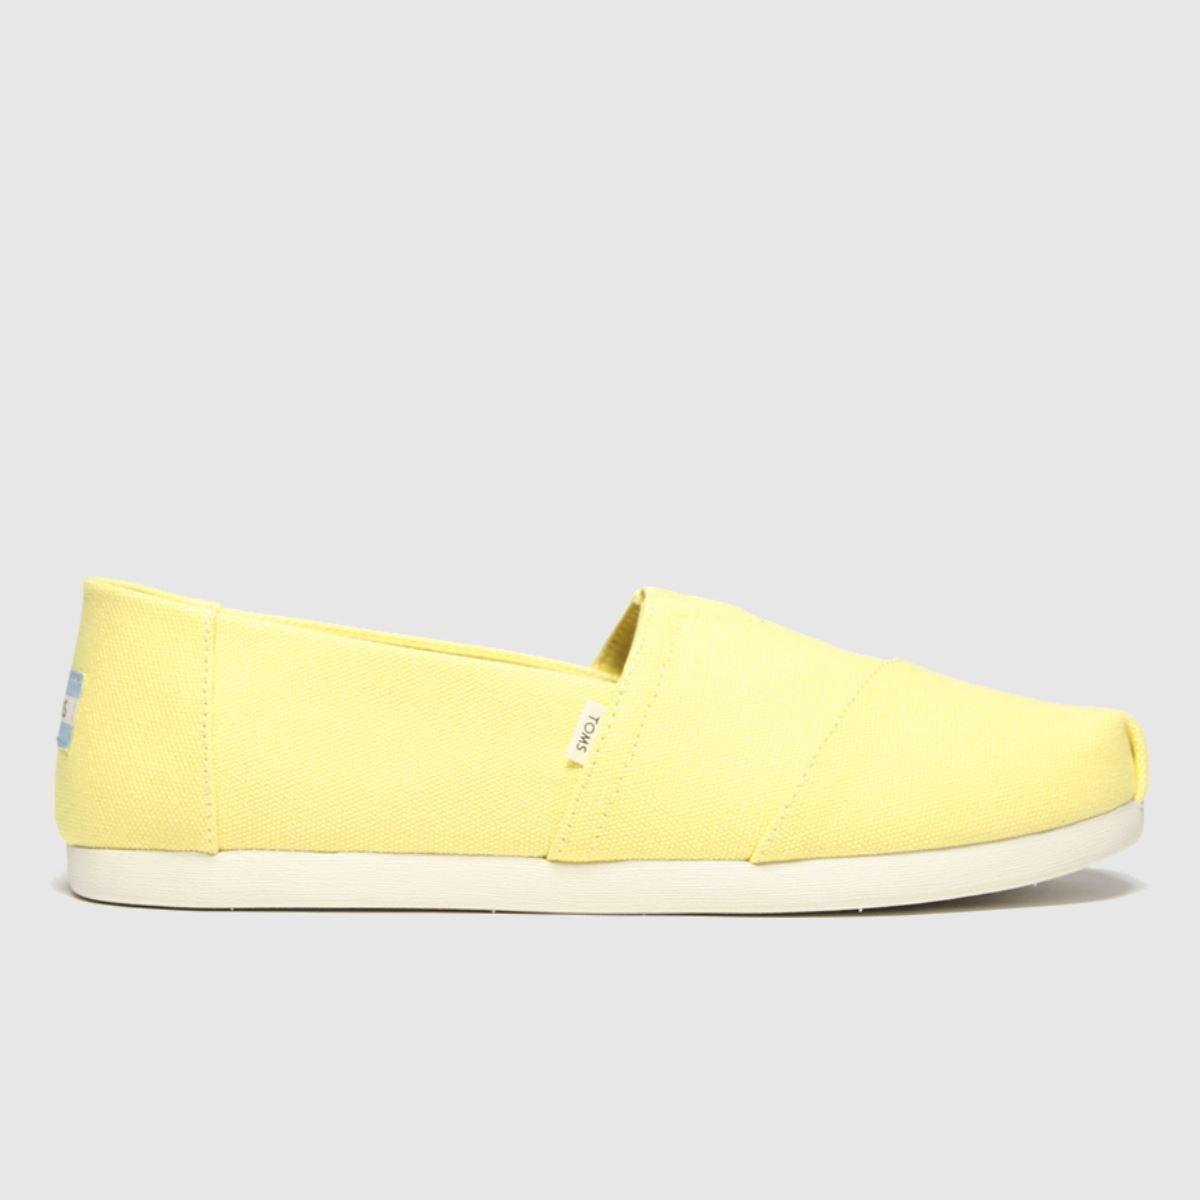 Toms Yellow Alpargata 3.0 Shoes